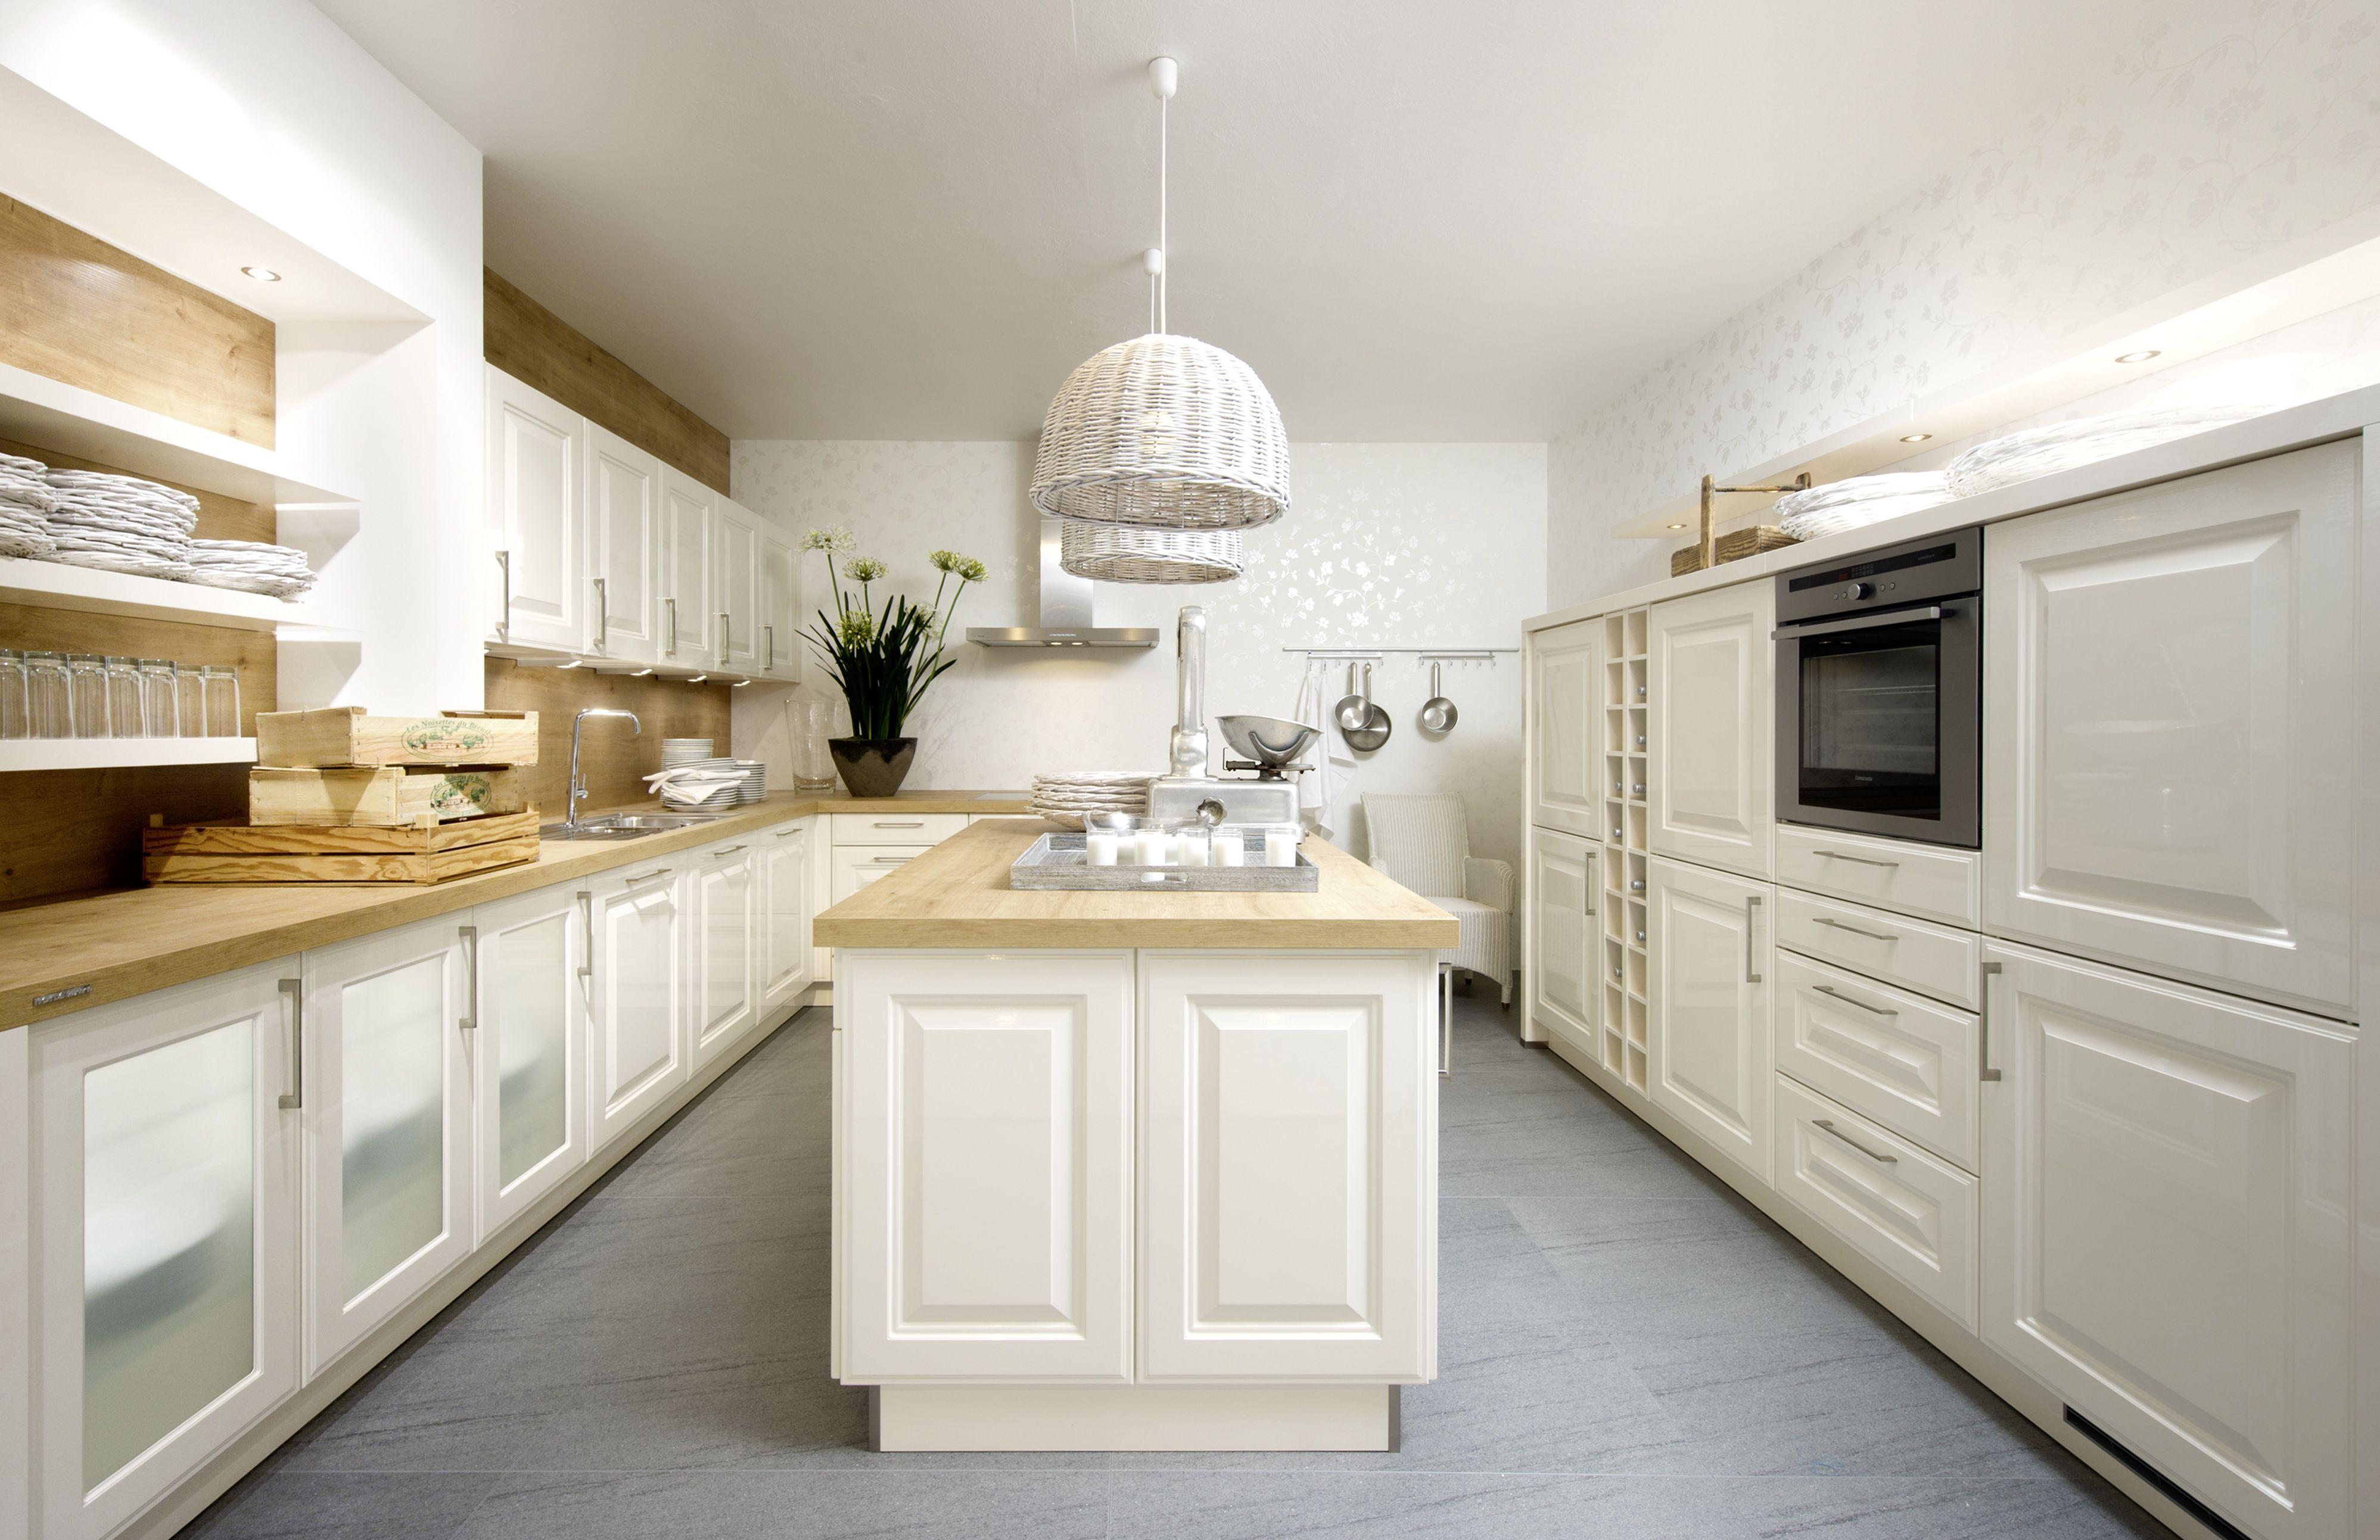 klassieke keuken tijdloze keuken kookeiland wit hout kookeiland klassieke keukens. Black Bedroom Furniture Sets. Home Design Ideas